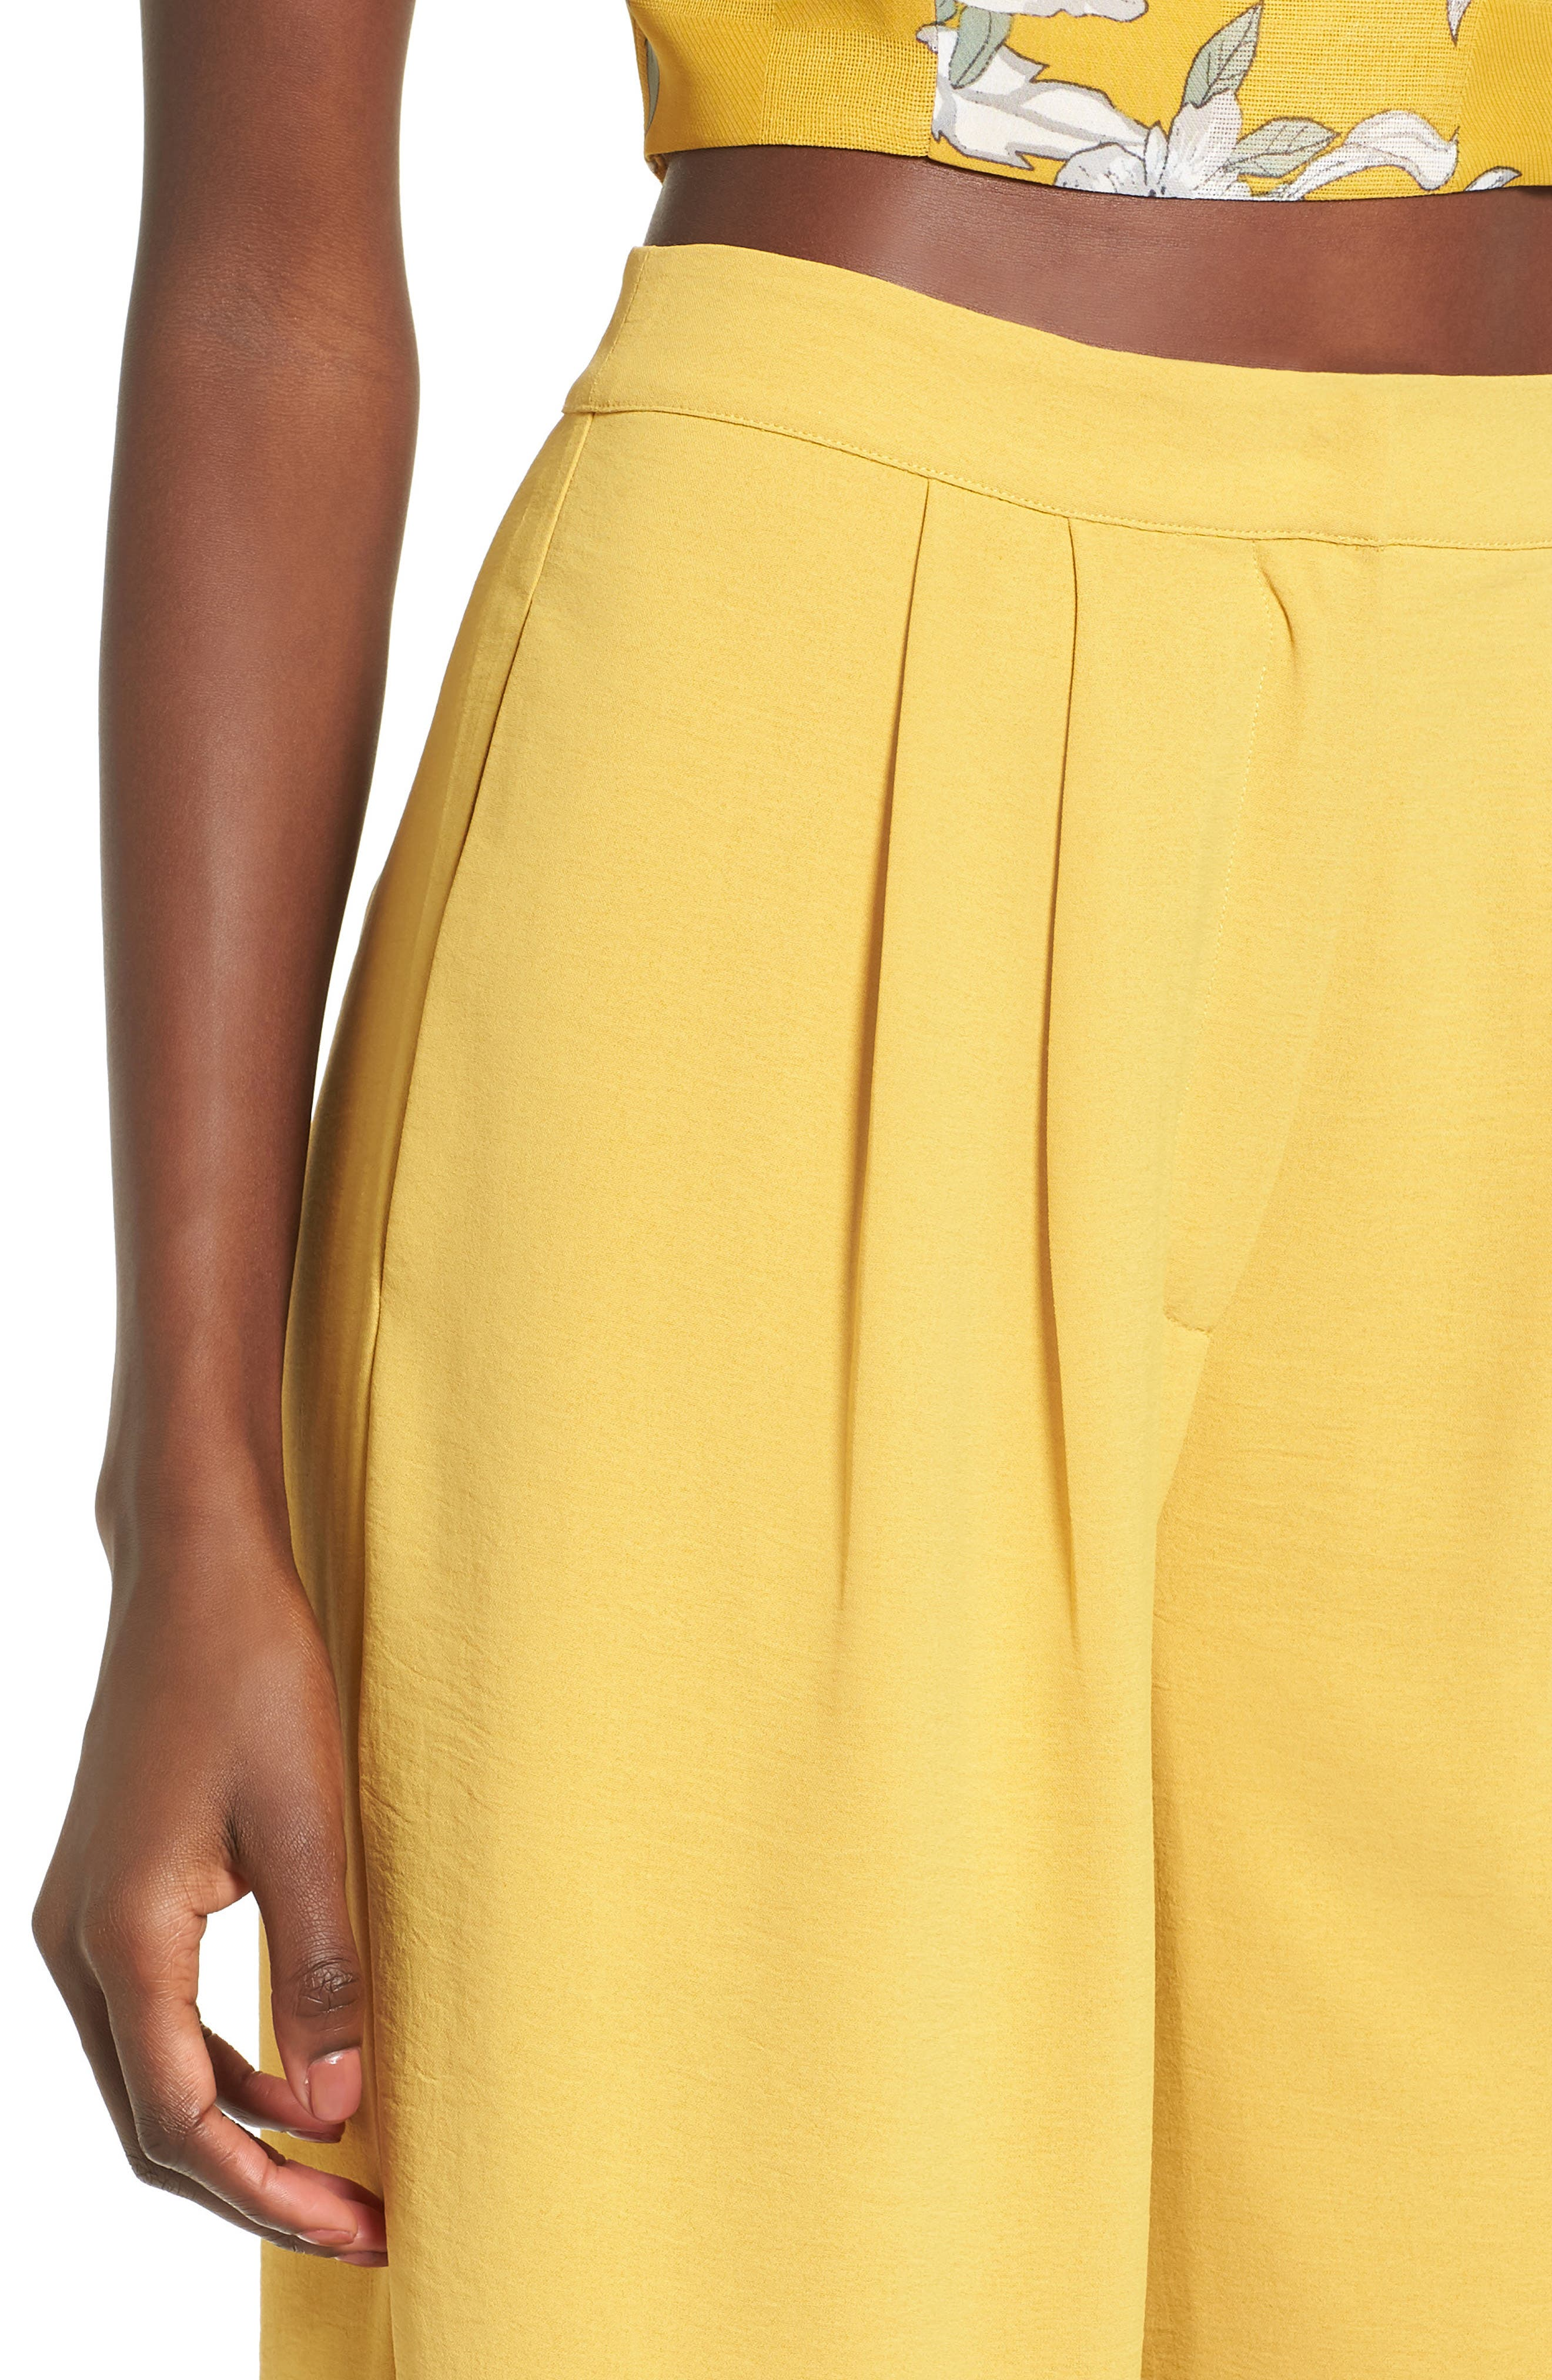 Chriselle x J.O.A. Pleat High Waist Crop Wide Leg Pants,                             Alternate thumbnail 6, color,                             Roman Gold